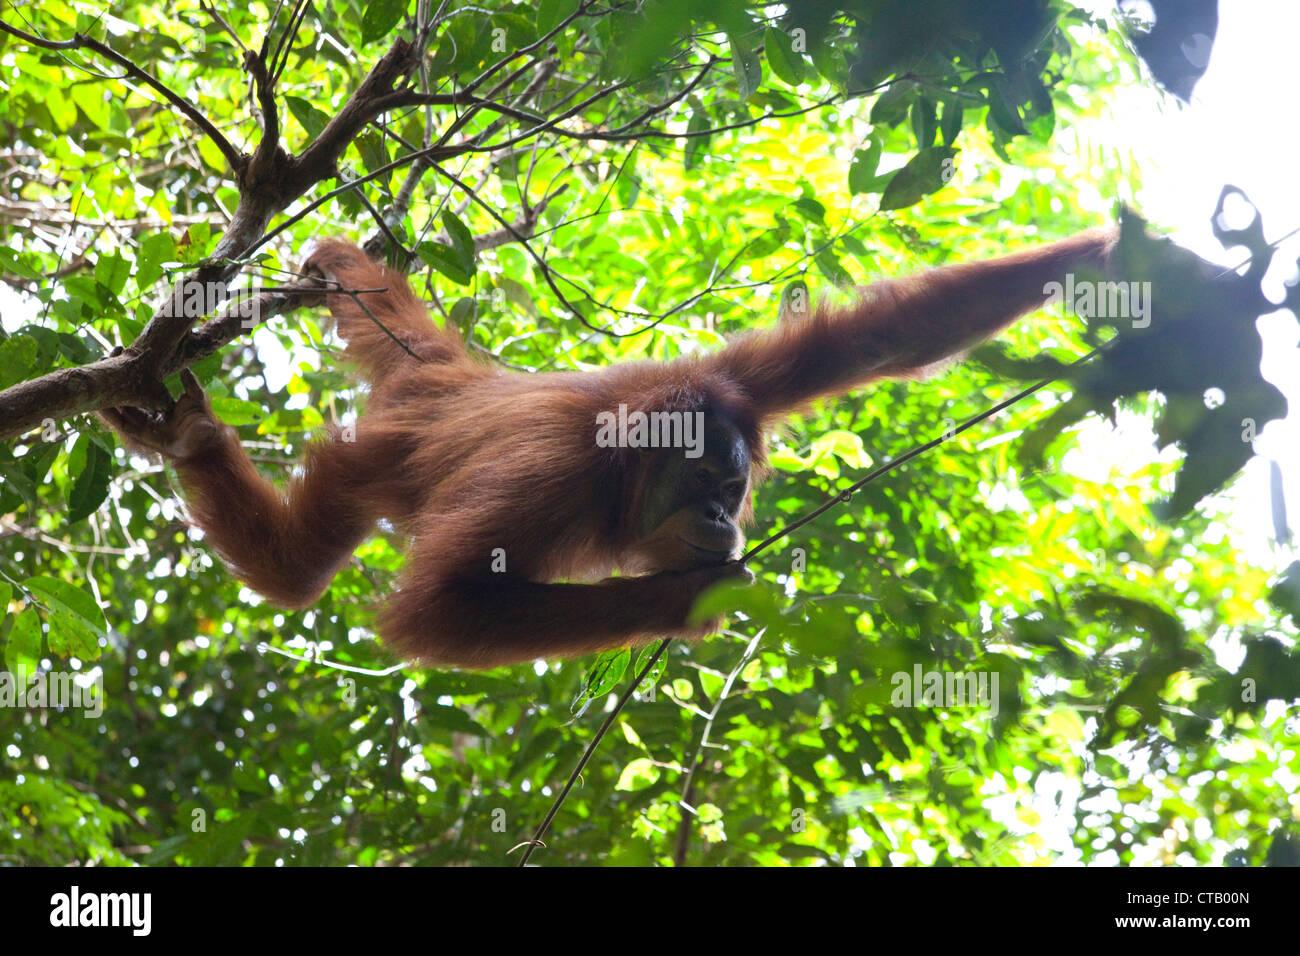 Orang Utan at the Gunung Leuser National Park near Bukit Lawang, Island of Sumatra, Indonesia, Southeast Asia Stock Photo